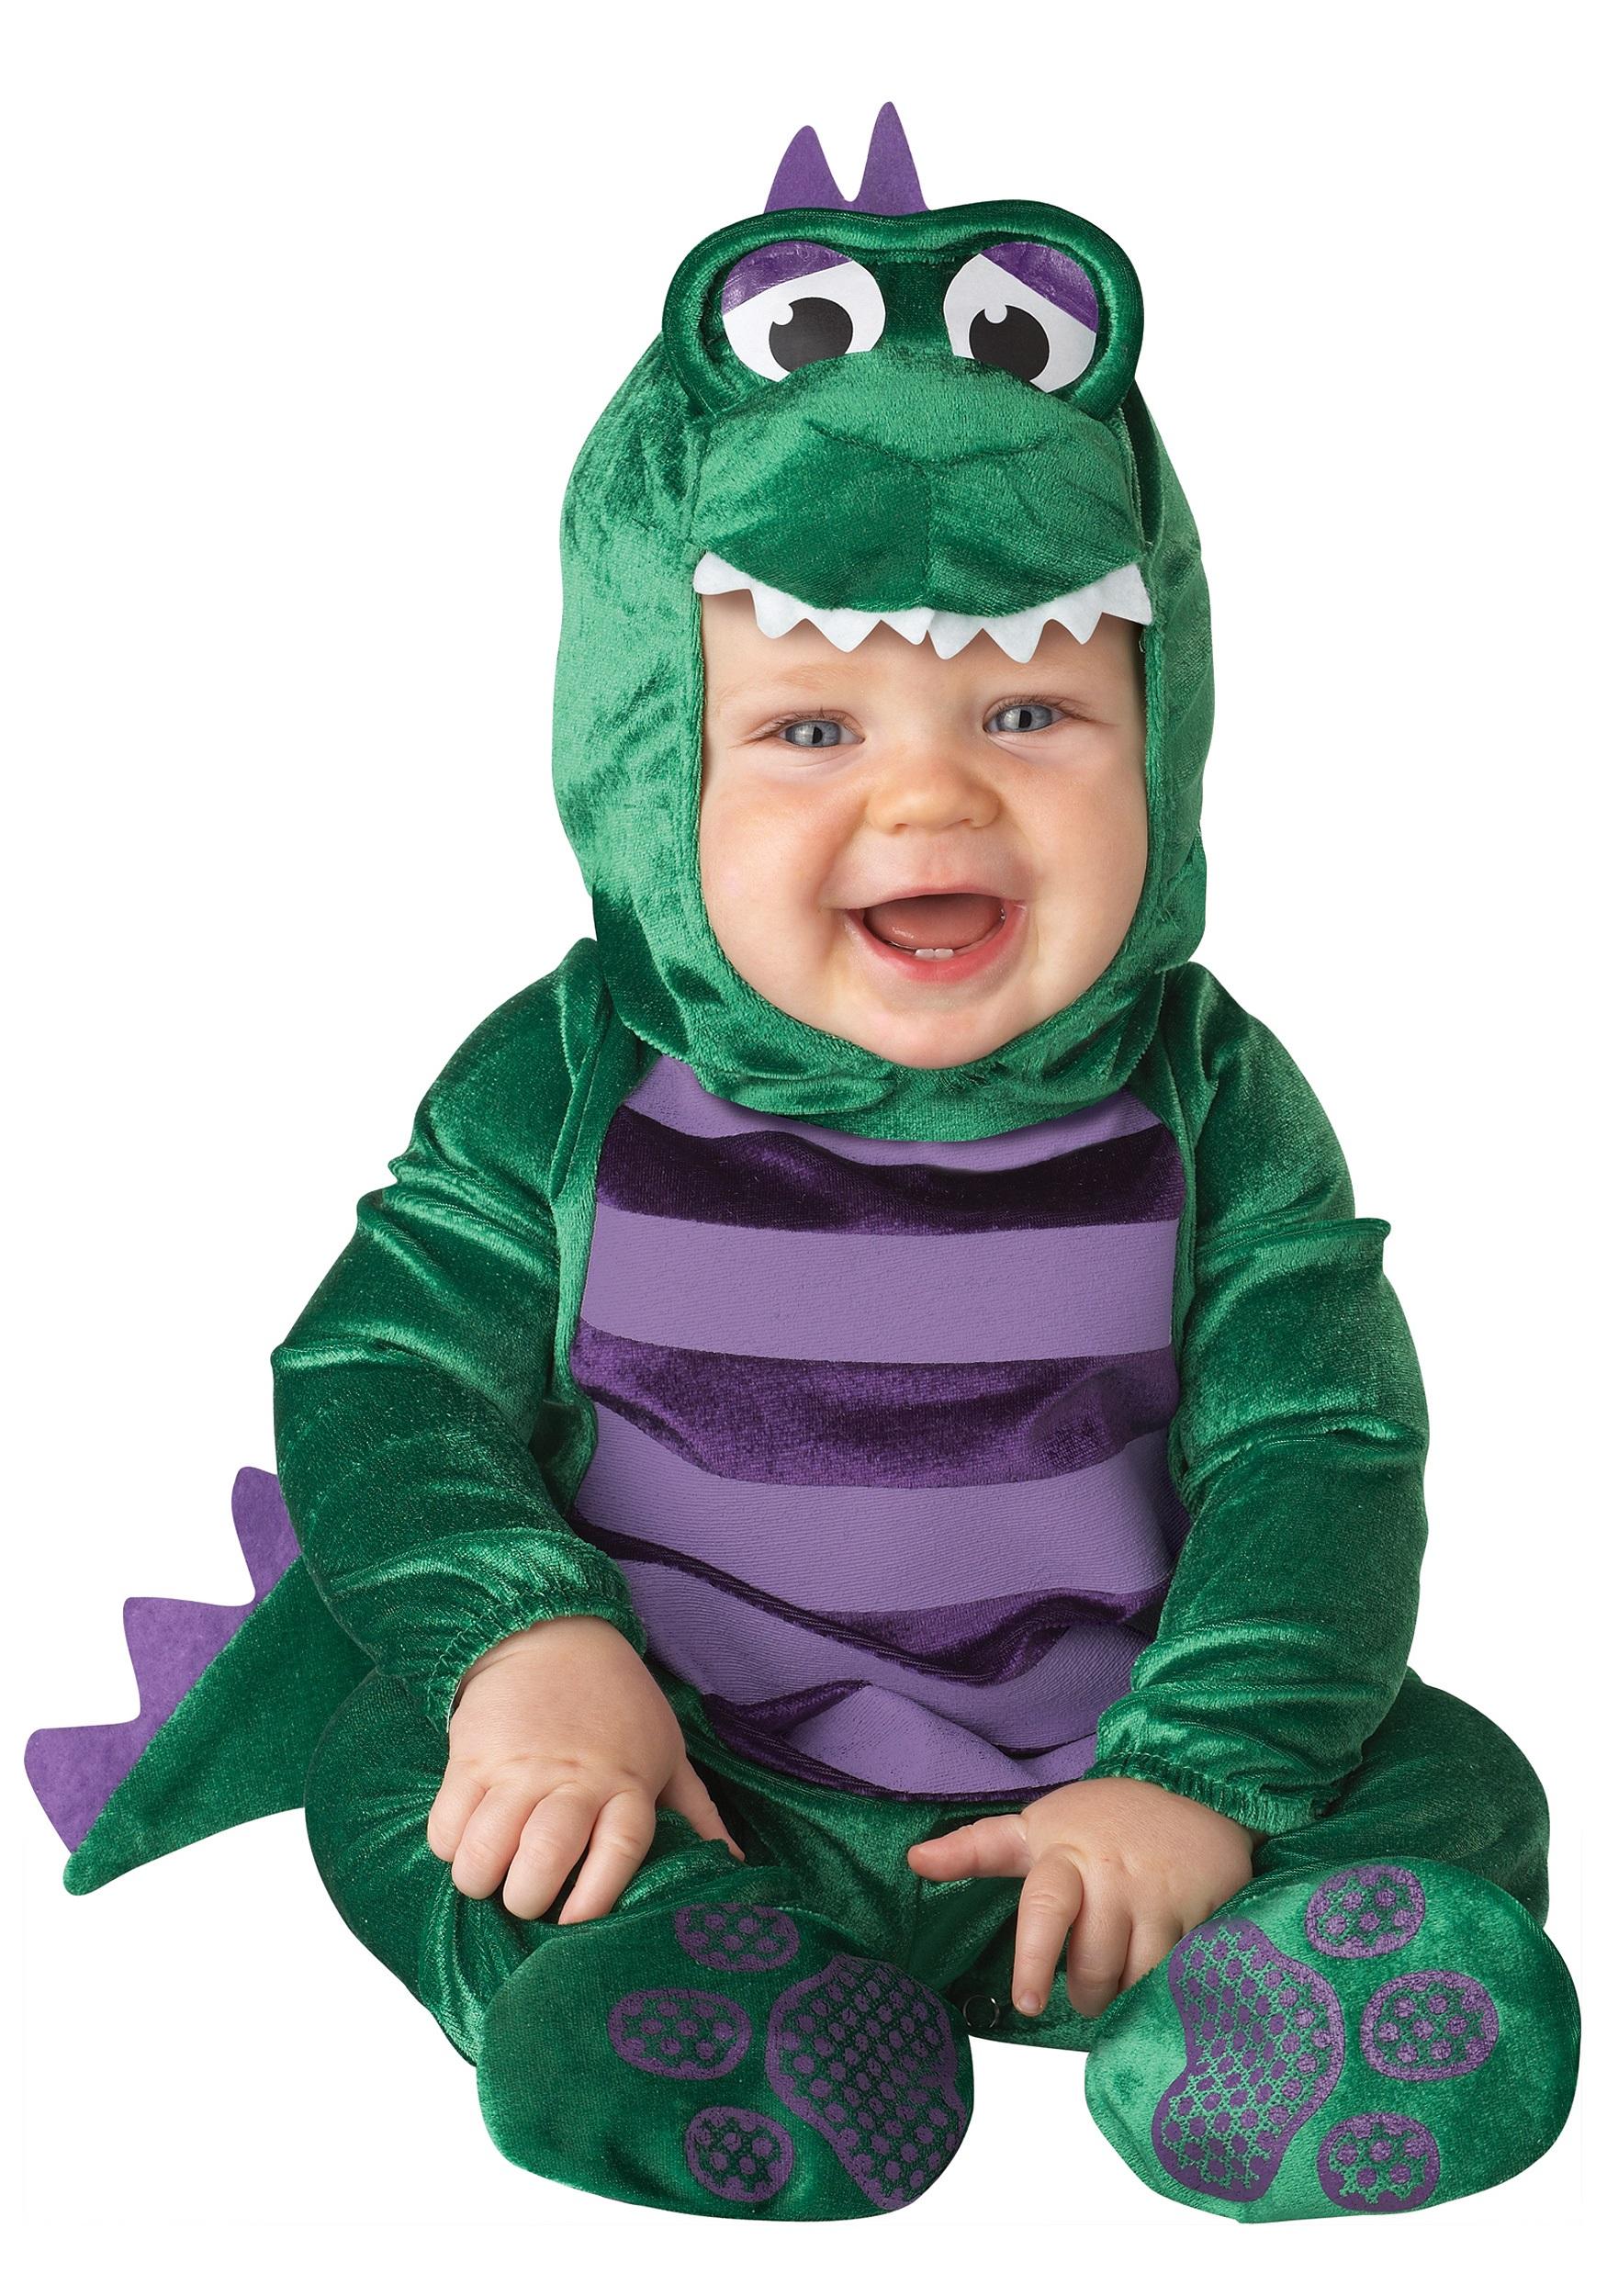 c8daeb13dd29 Dino Infant Costume - Infant Animal Costumes